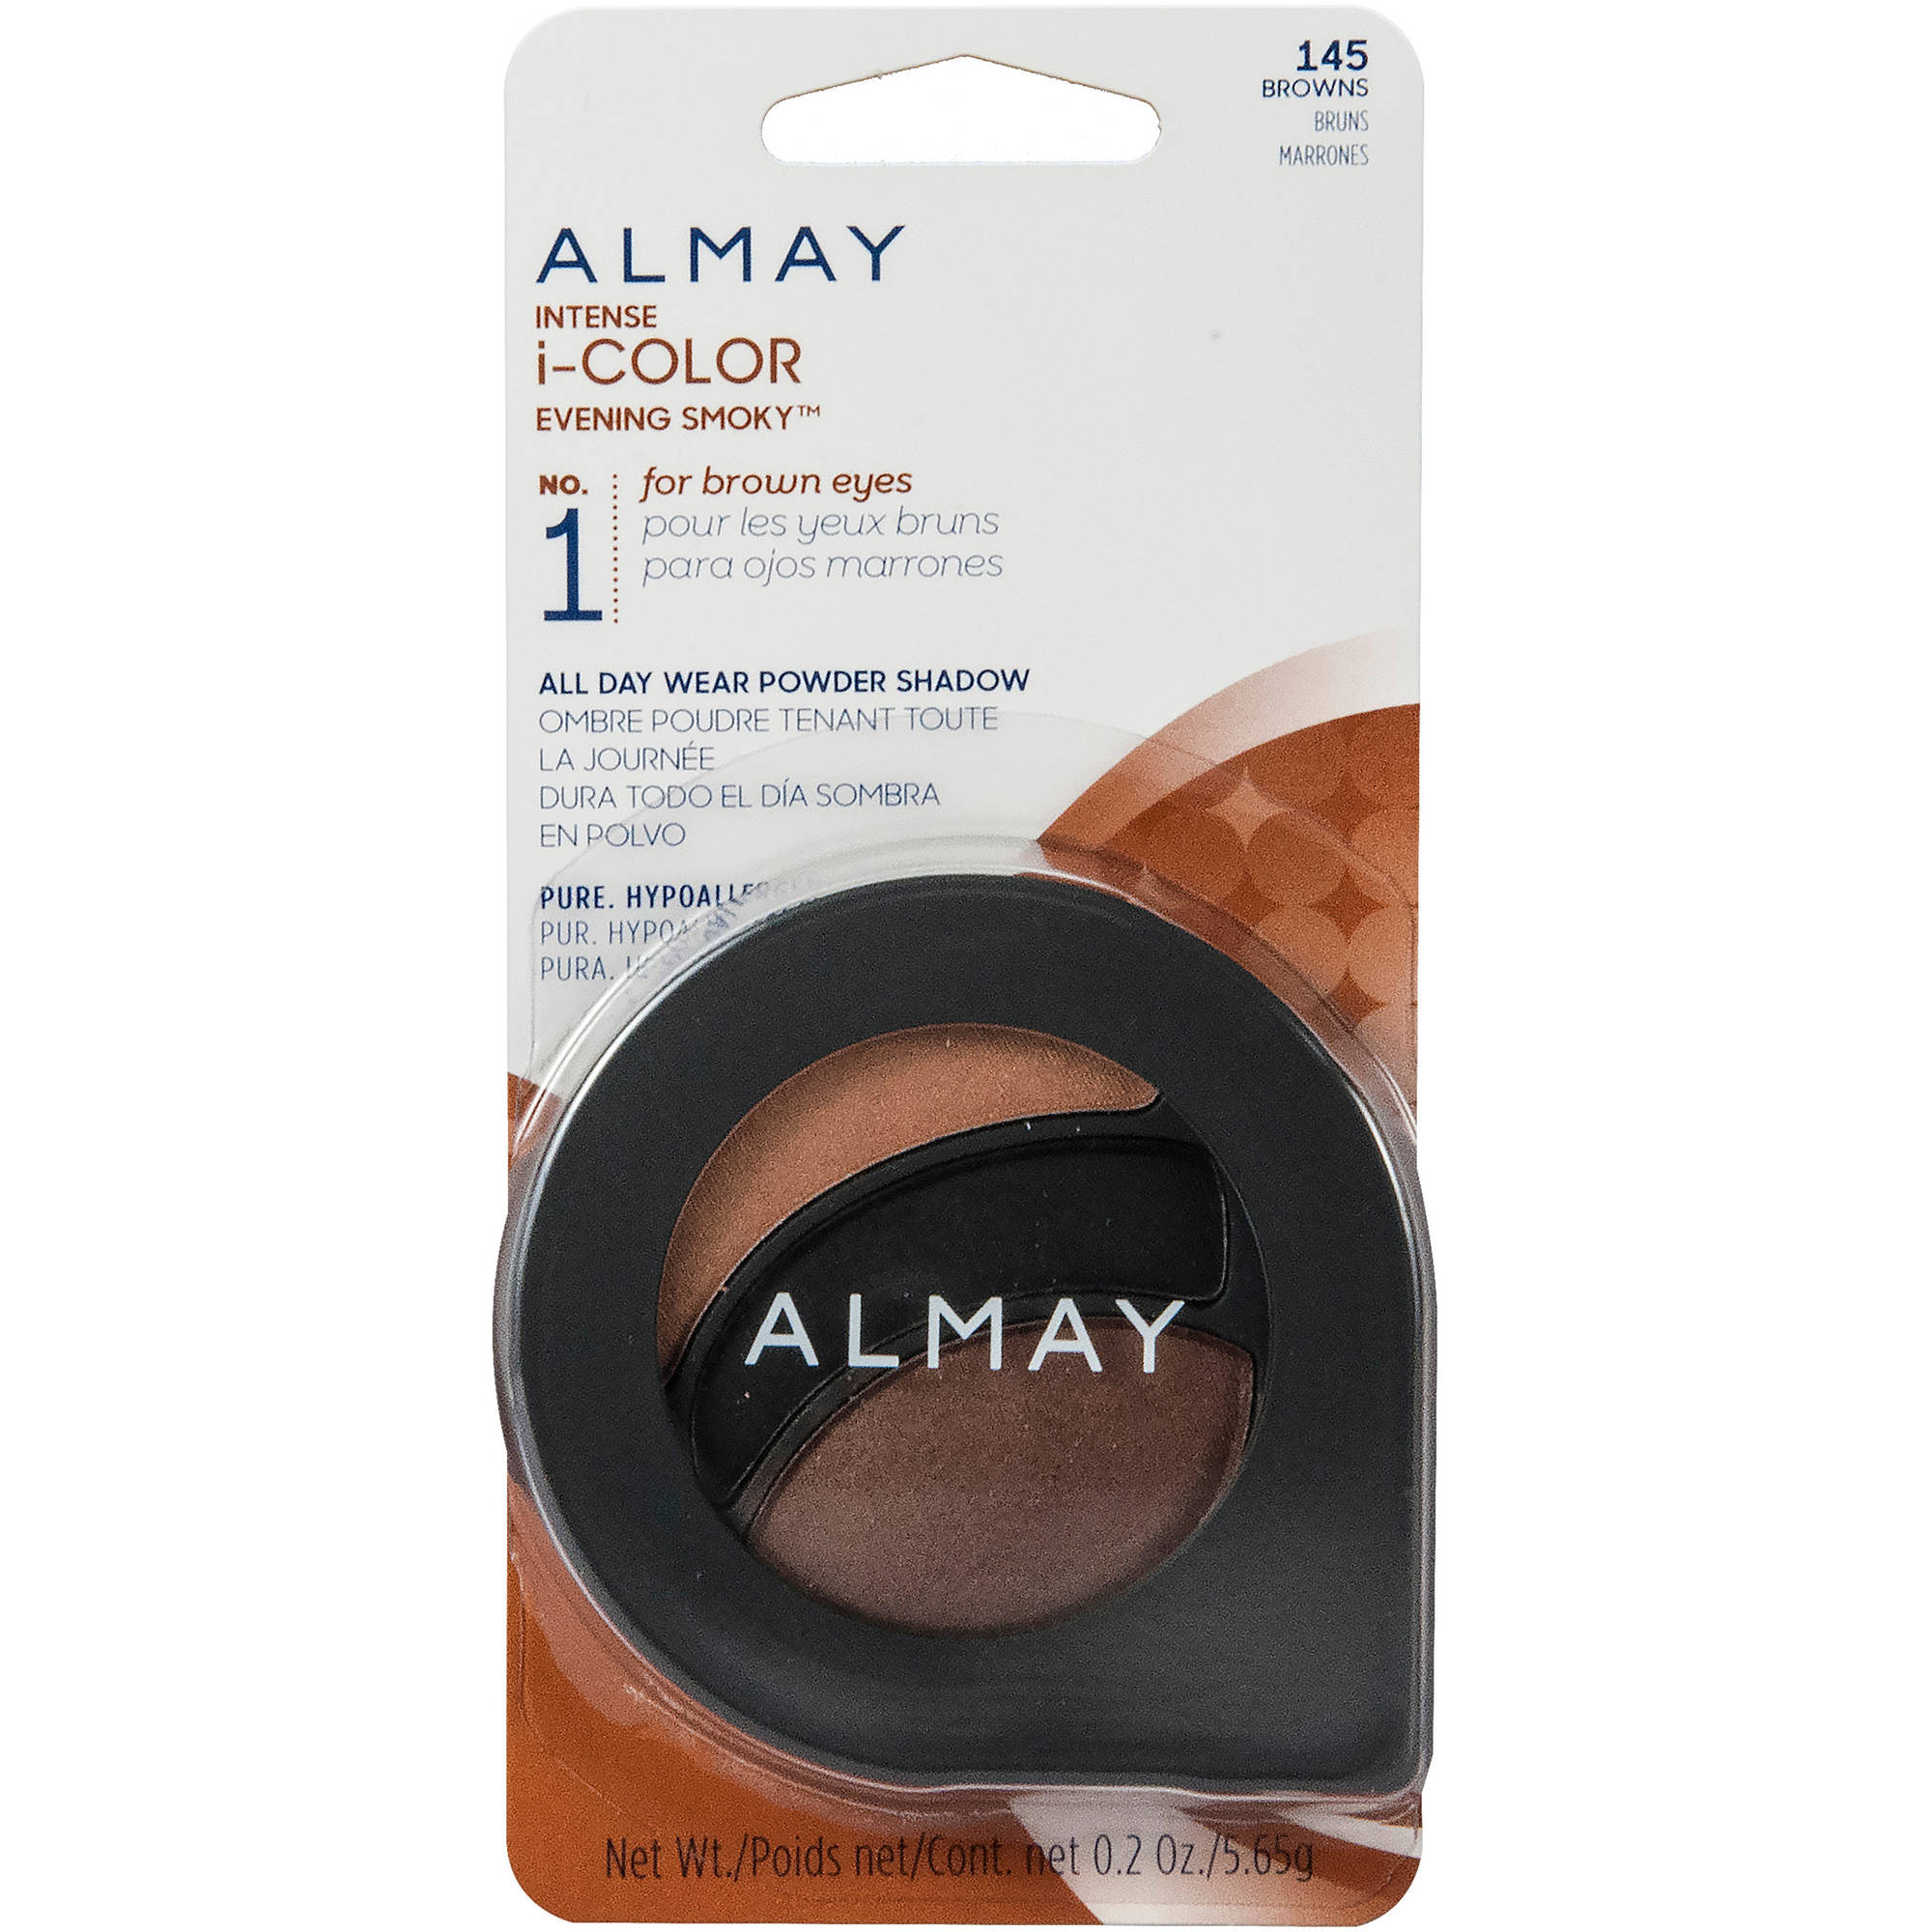 Almay Intense I-Color Evening Smoky All Day Wear Powder Eye Shadow, 0.2 oz